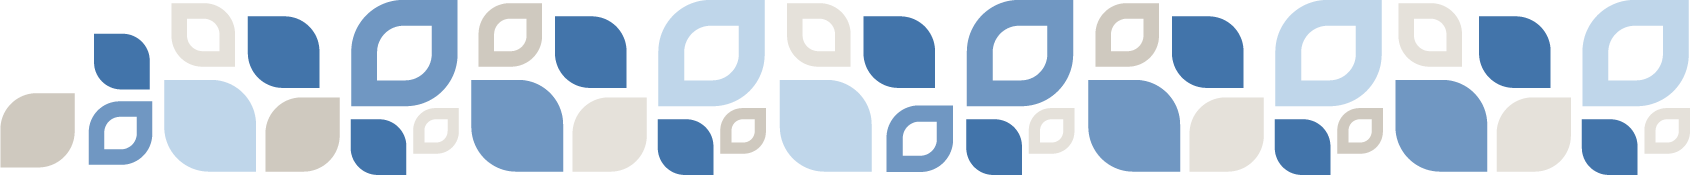 logo-element-1